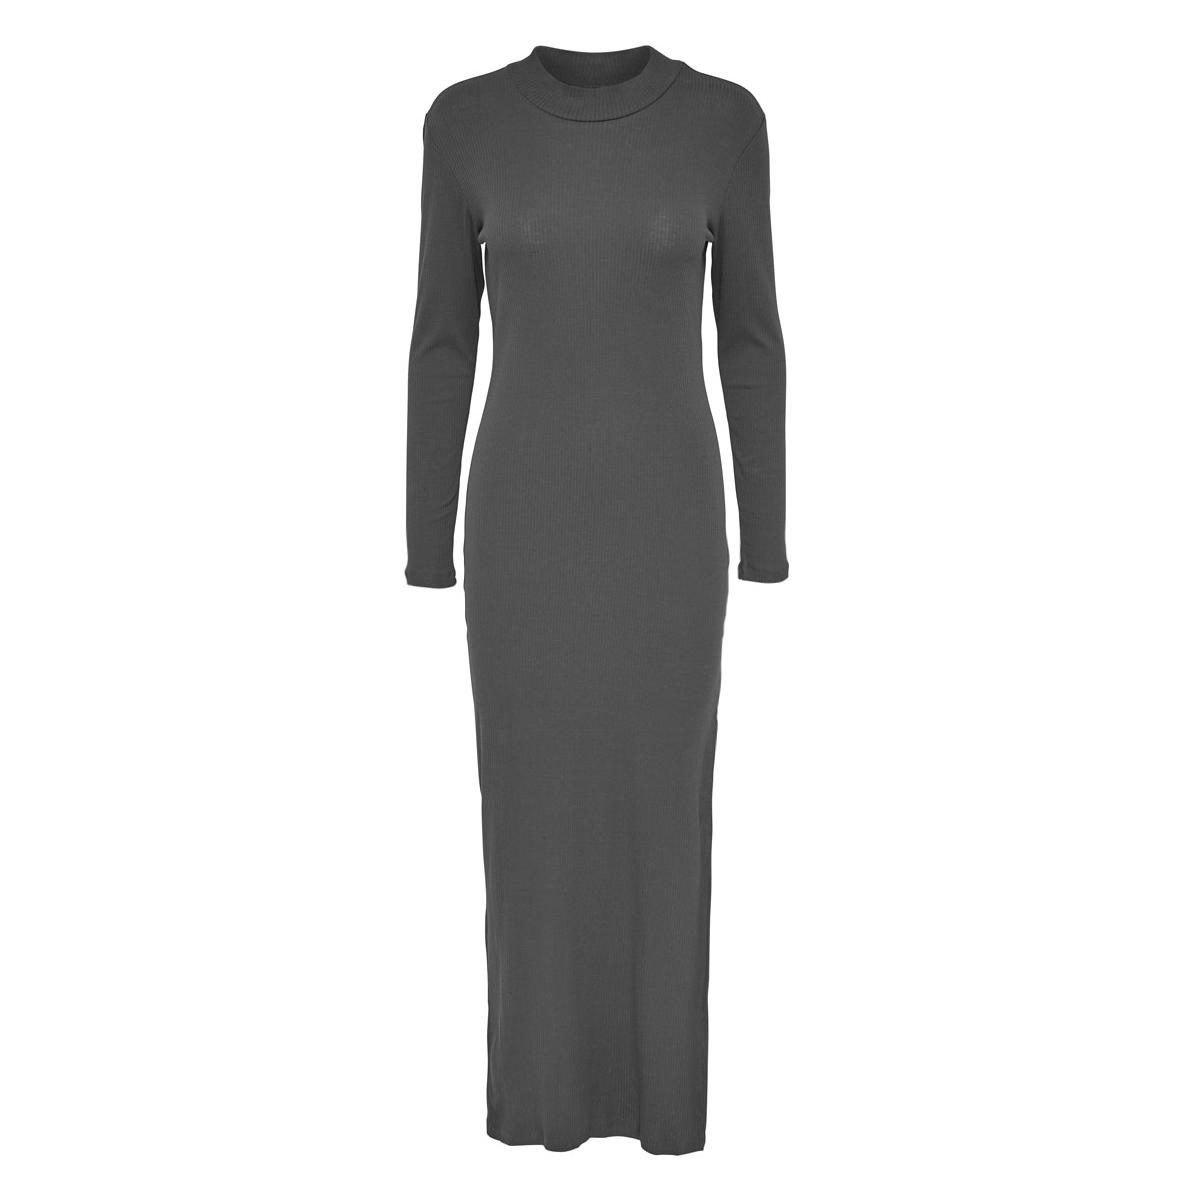 jdyribby l/s dress jrs 15117769 jacqueline de yong jurk dark grey melange